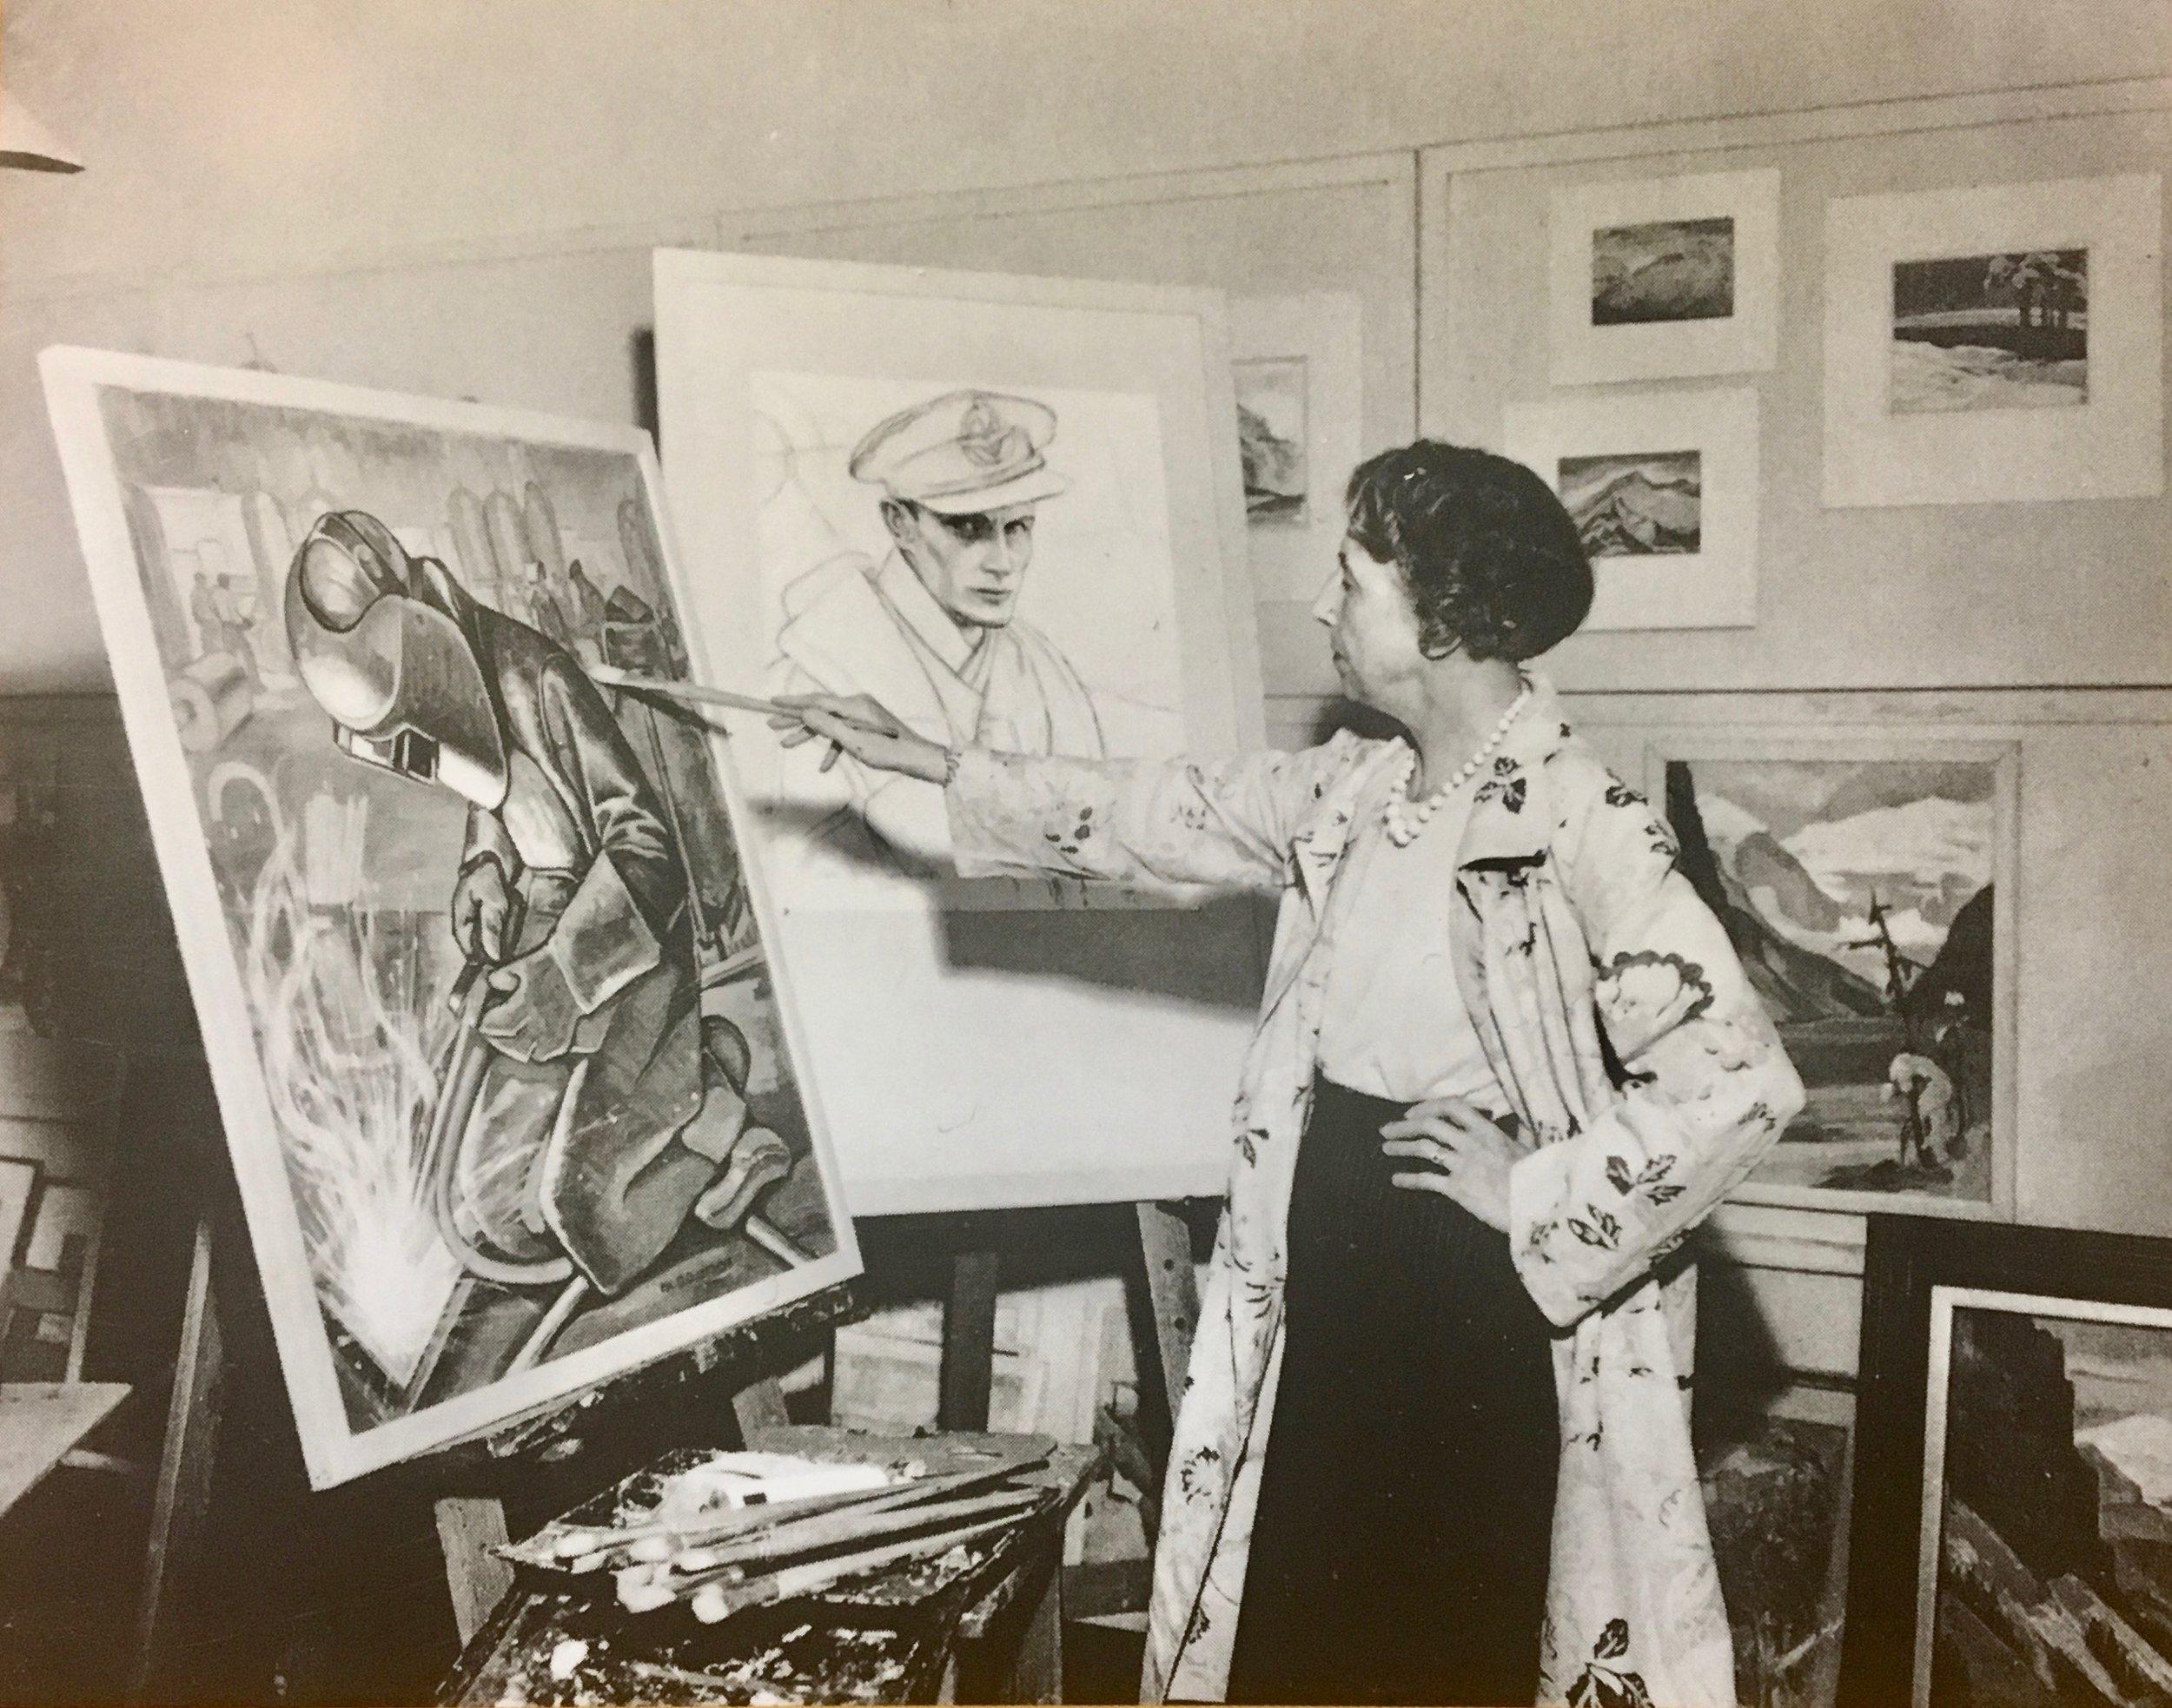 Ina Uhthoff in her studio, photo courtesy of Mother Tongue Publishing